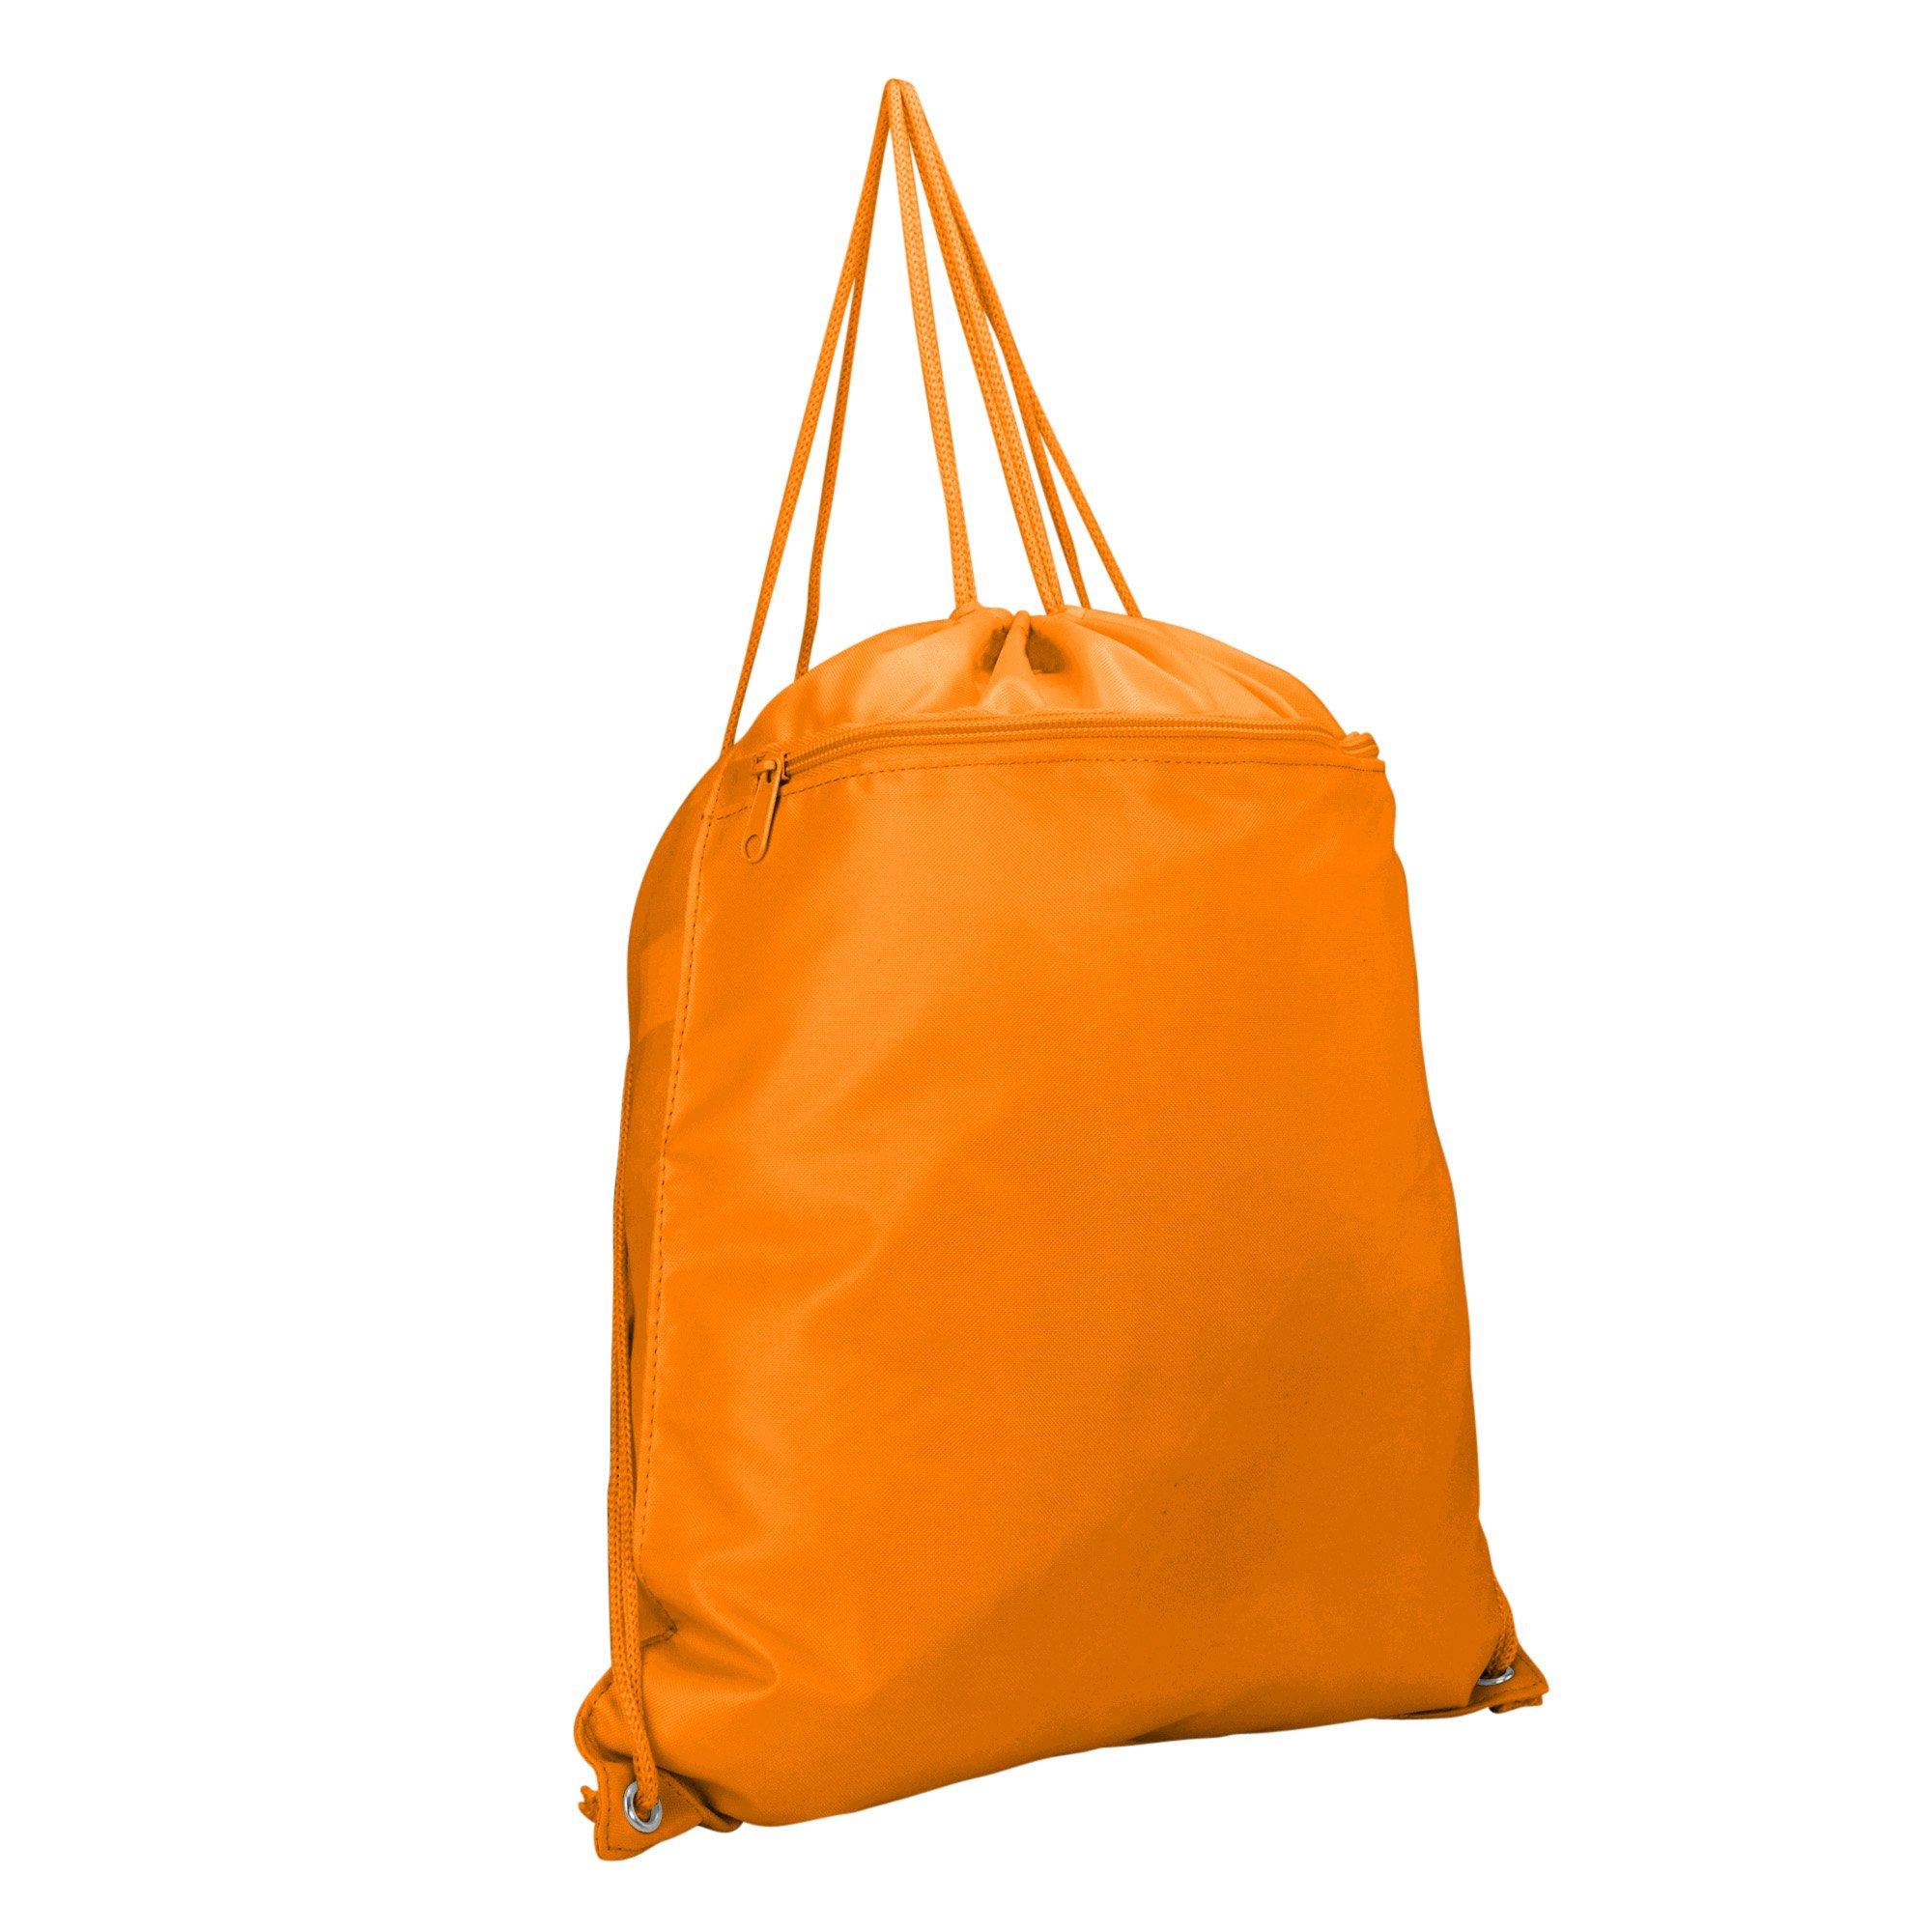 DALIX Drawstring Backpack Sack Bag in Orange